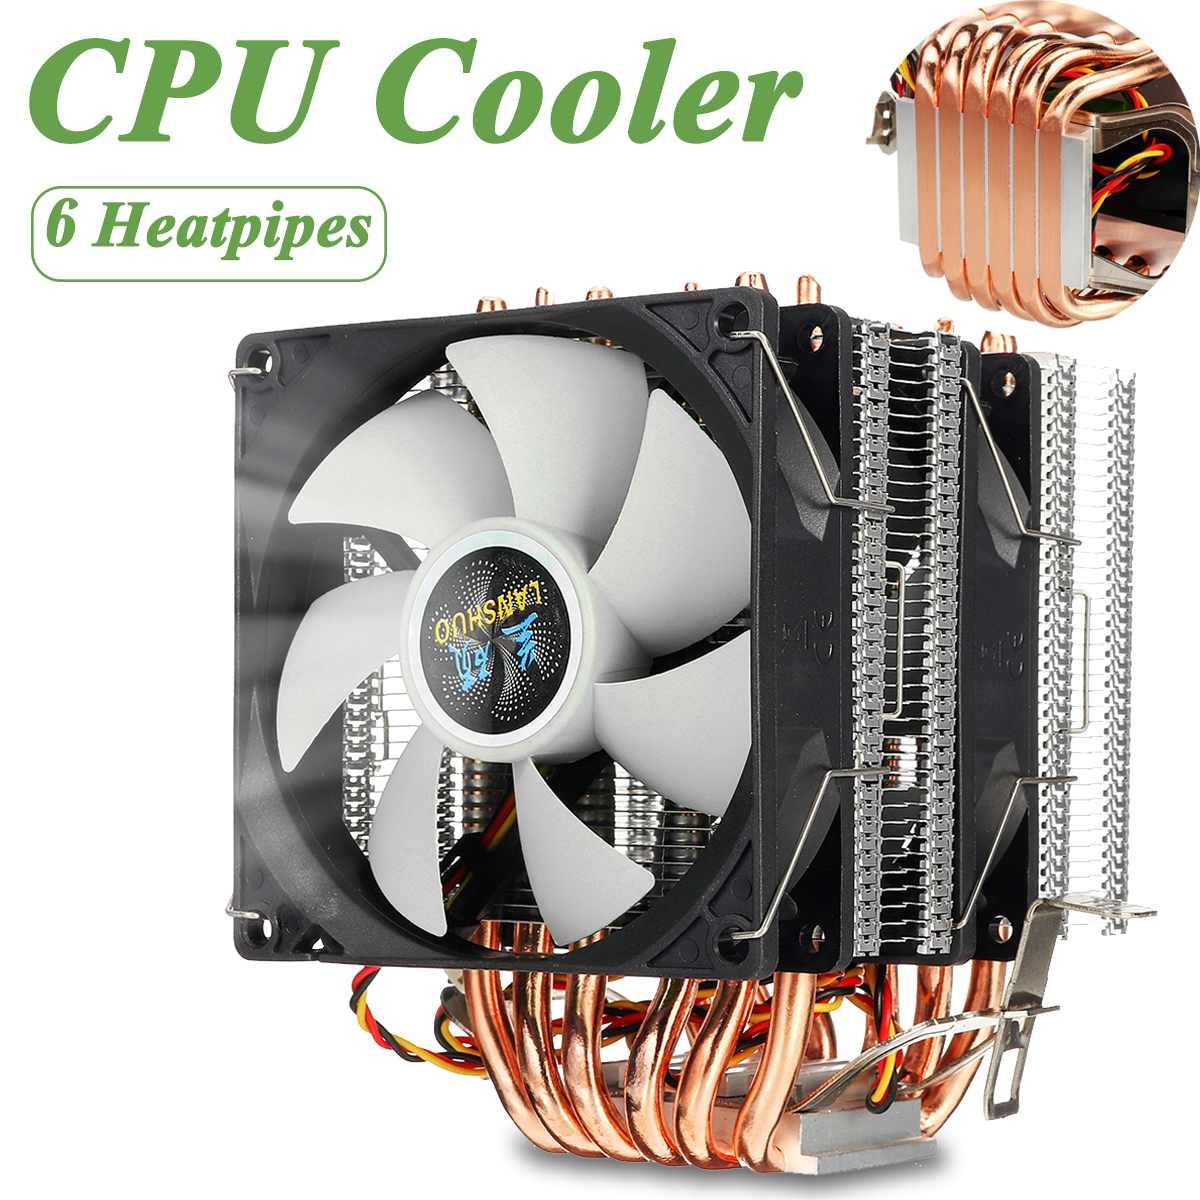 CPU Cooler 6 Heat Pipes 3pin Dual Fan Cooler Quiet Cooling Fan Heatsink Radiator for LGA 1150/1151/1155/1156/1366/775 for AMD 車 中泊 扇風機